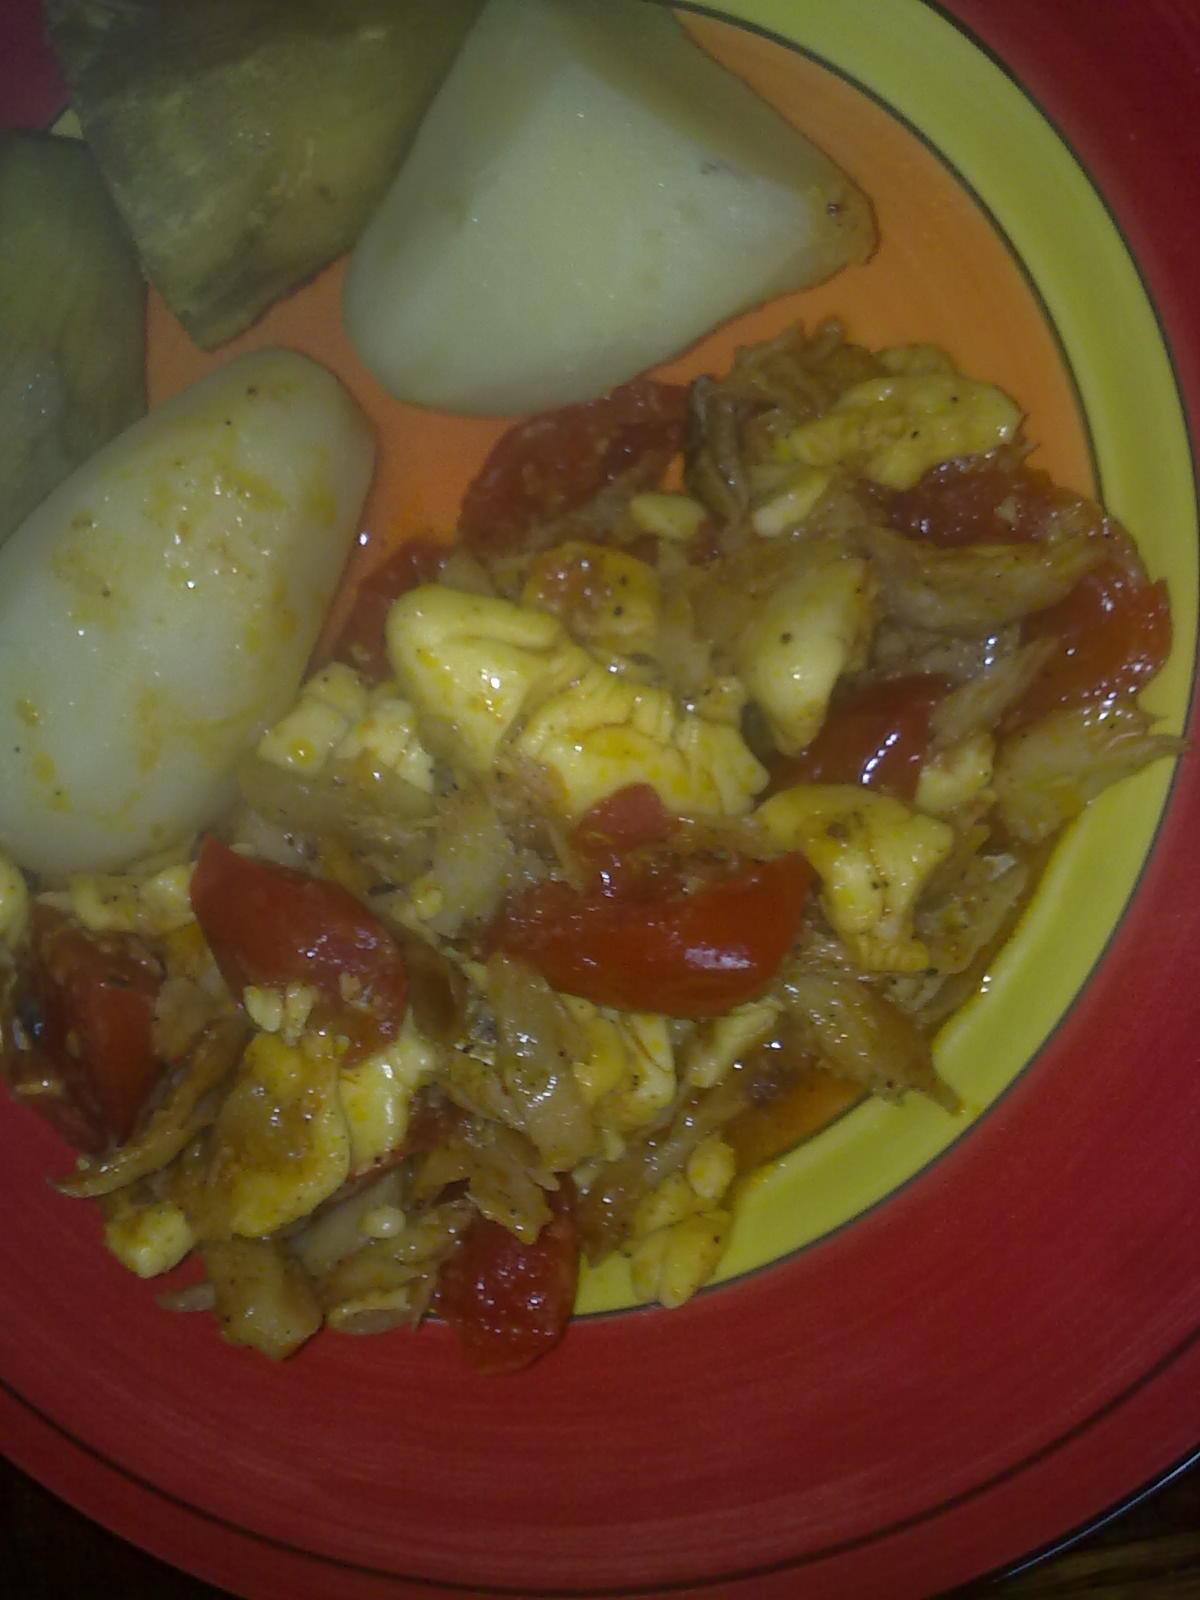 Jamaica National Dish - Ackee and Saltfish